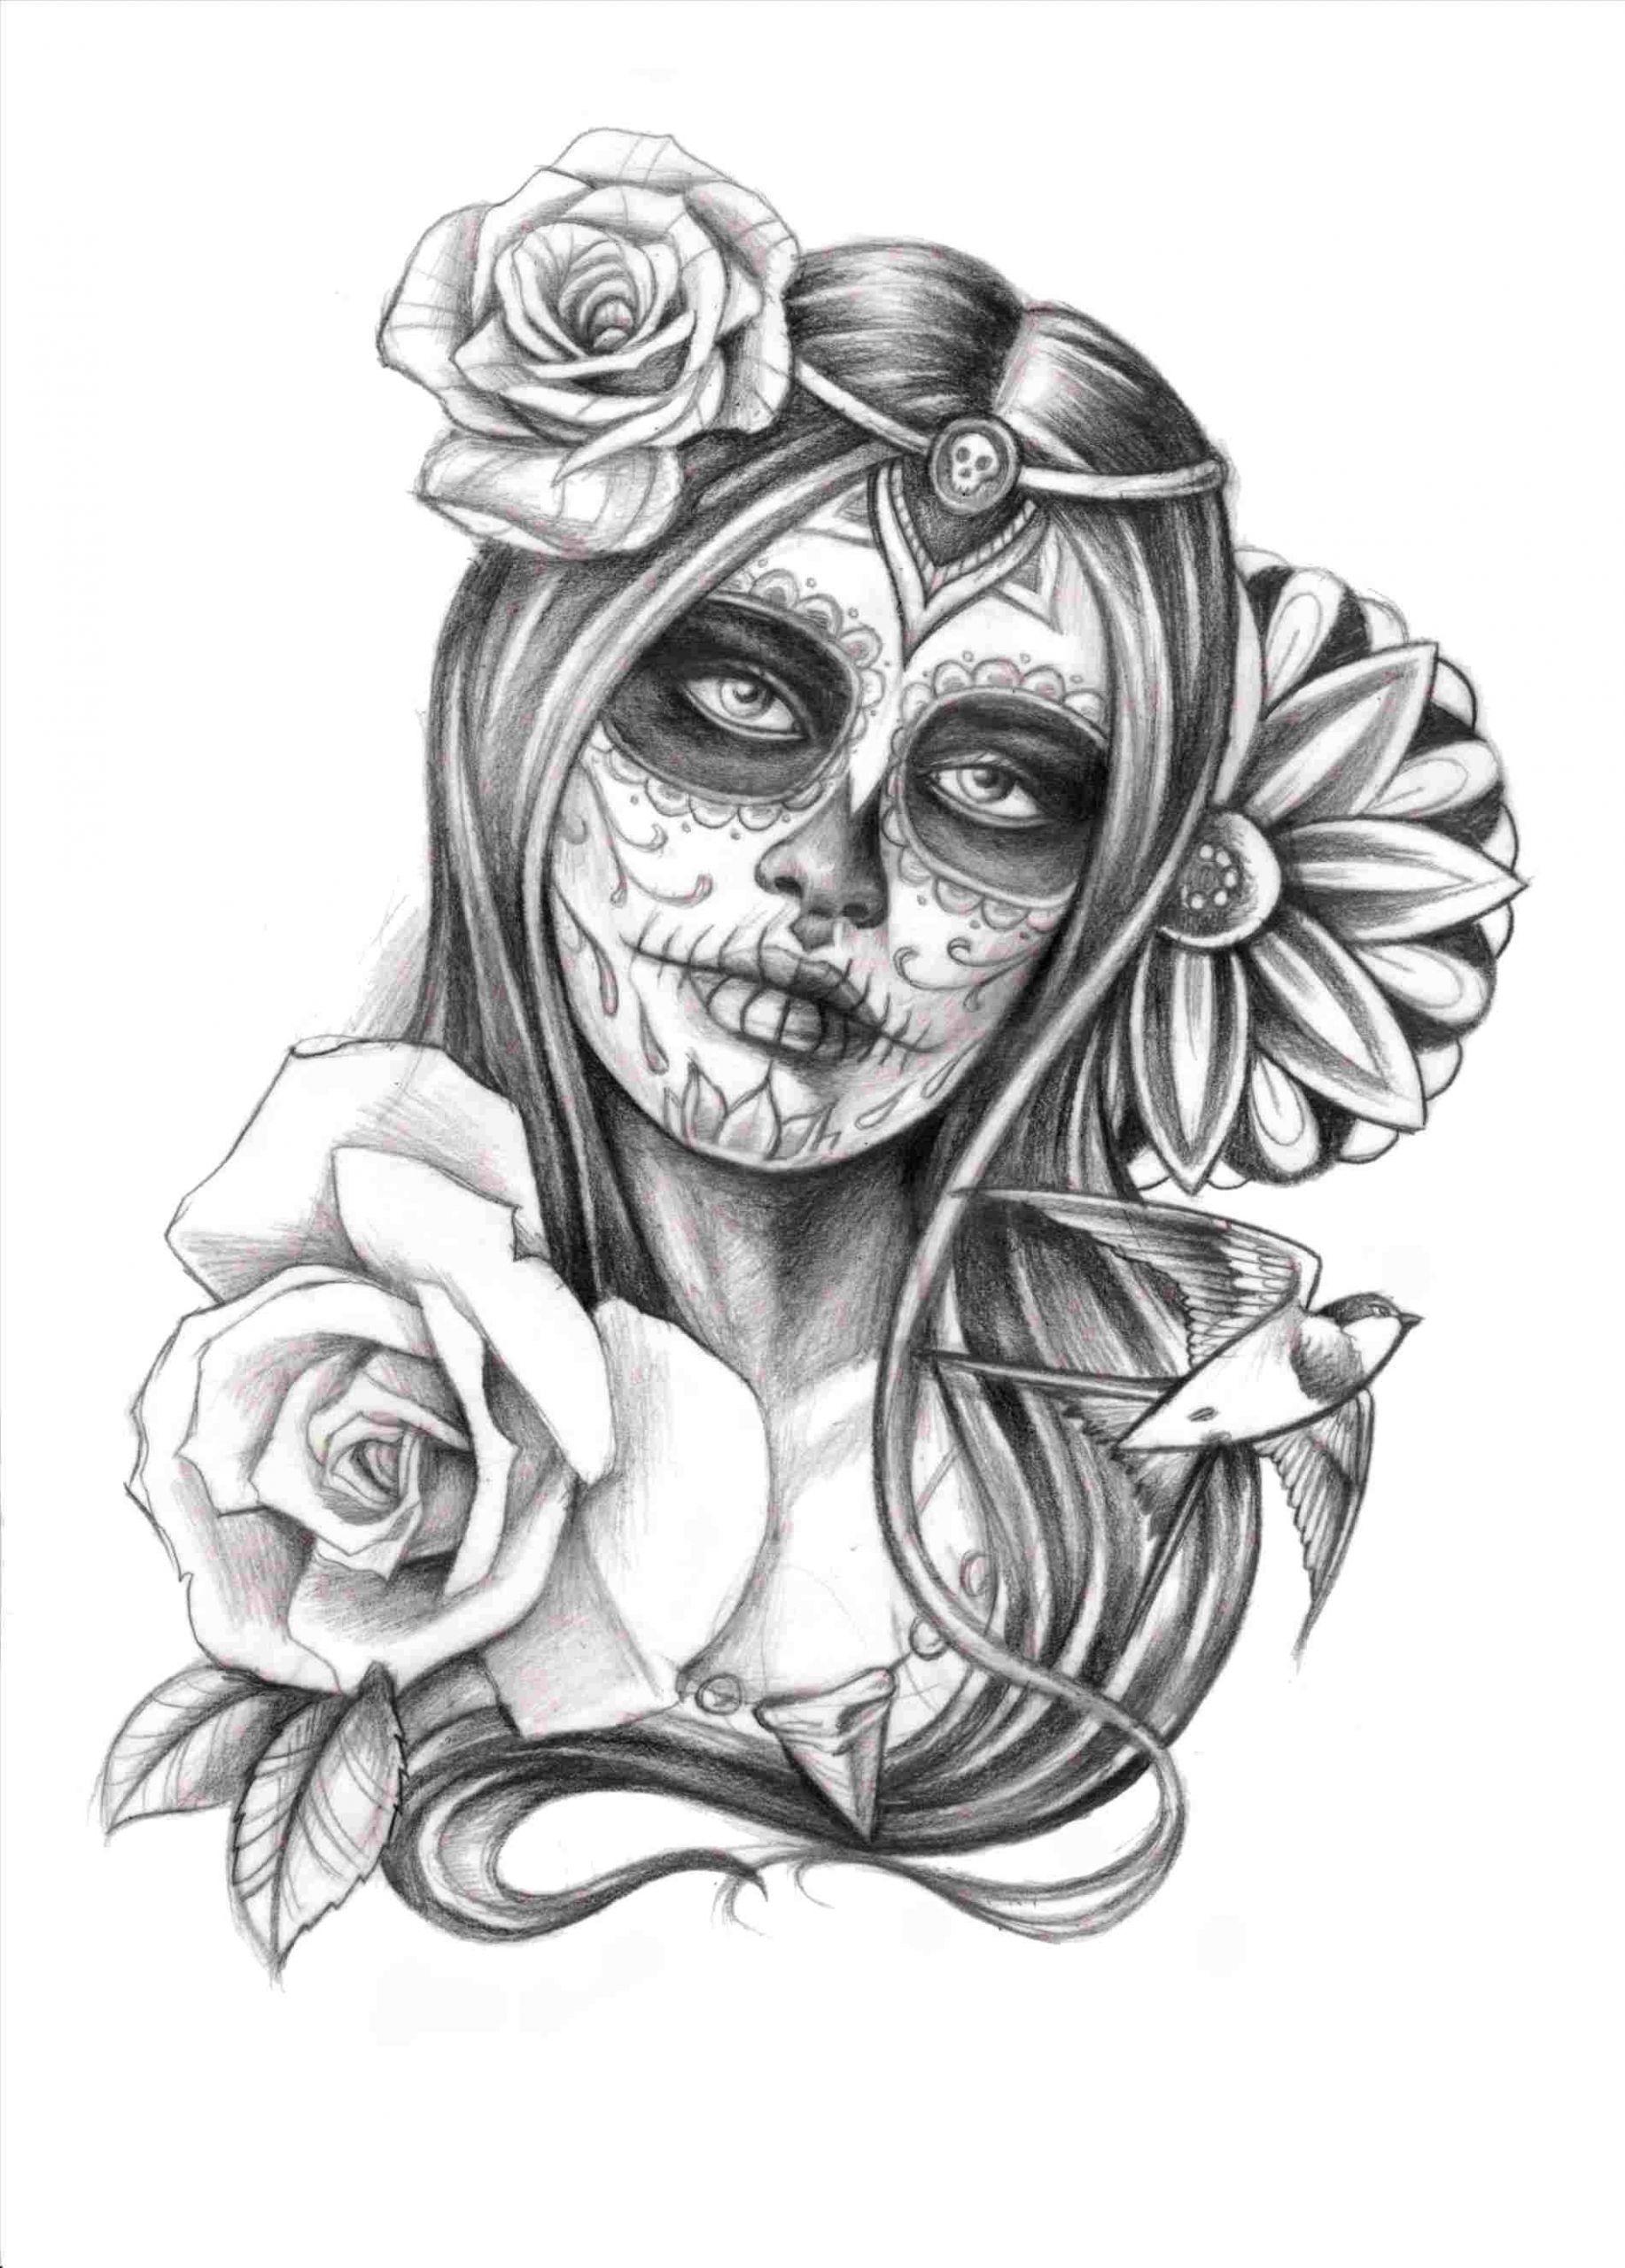 tattoos of day od dead girl drawing the sugar skull tattoo pinterest tattoos rhpinterestcom black white illustration stock vector royalty free rhshutterstockcom black day od dead jpg